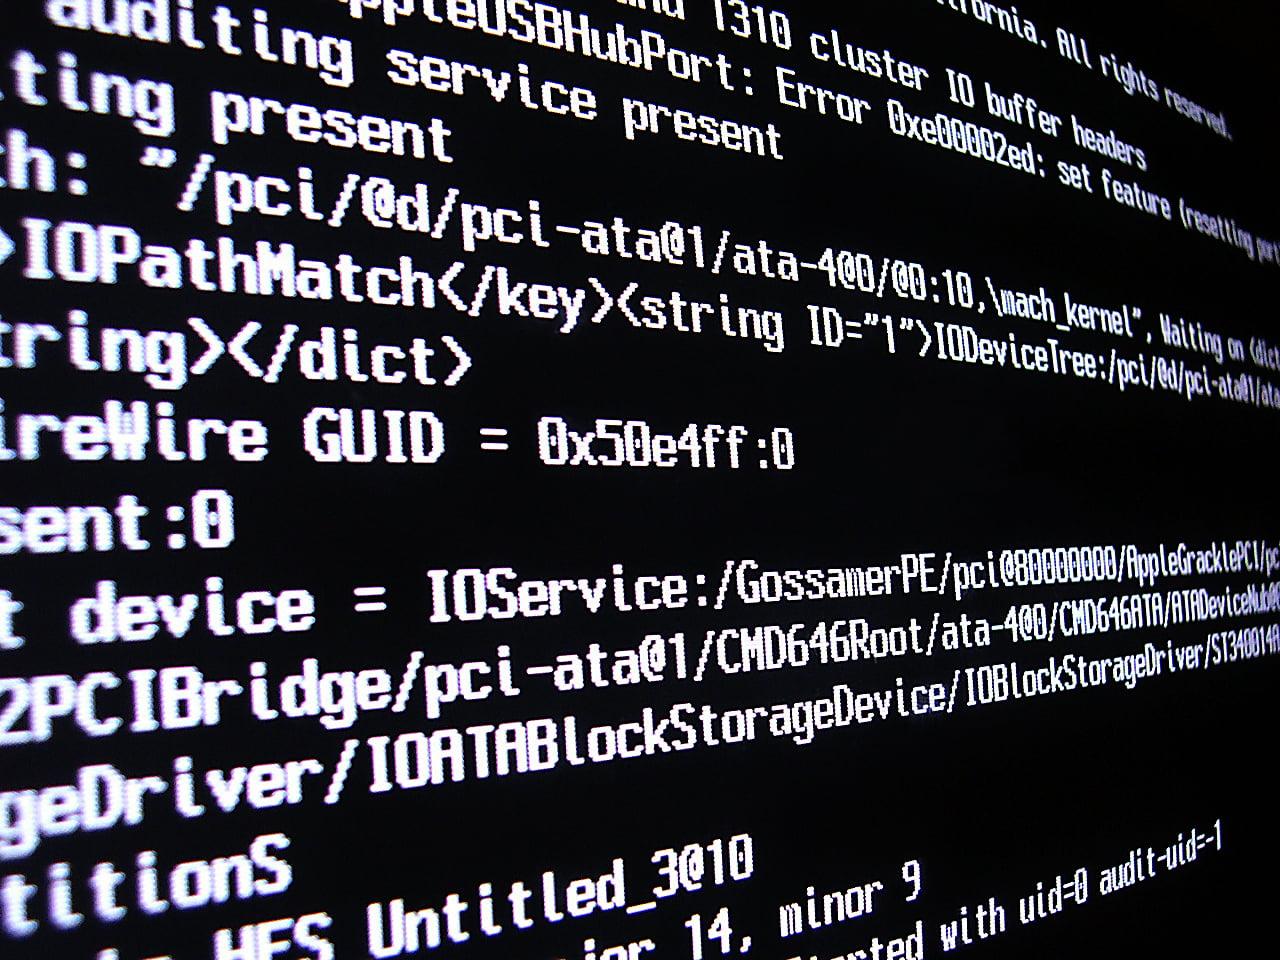 bitcoin mining, bitcoin cloud mining, mining hashrate